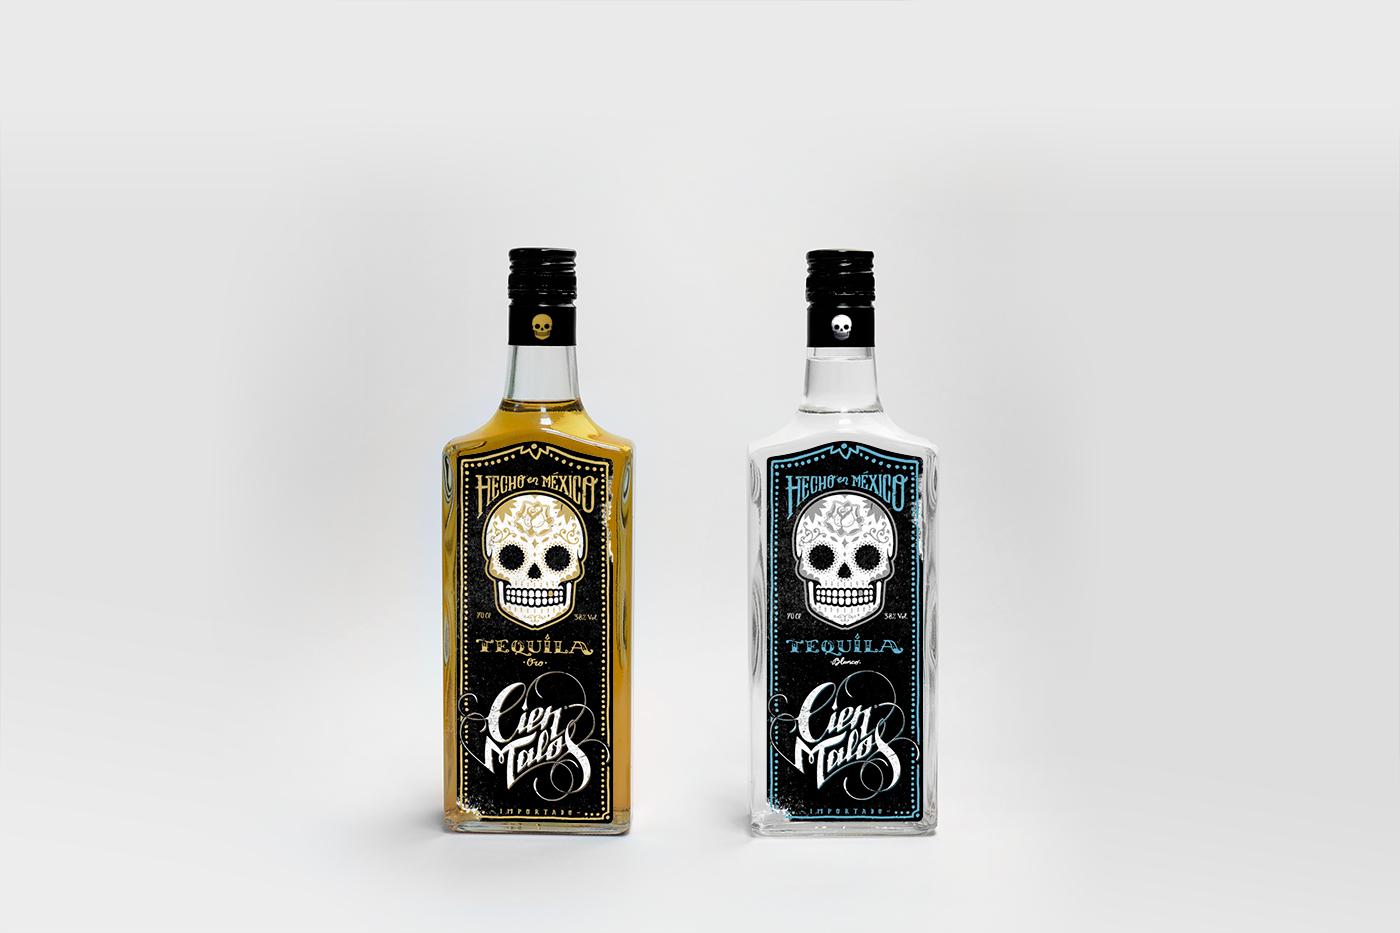 Diseño de packaging tequila Cien Malos